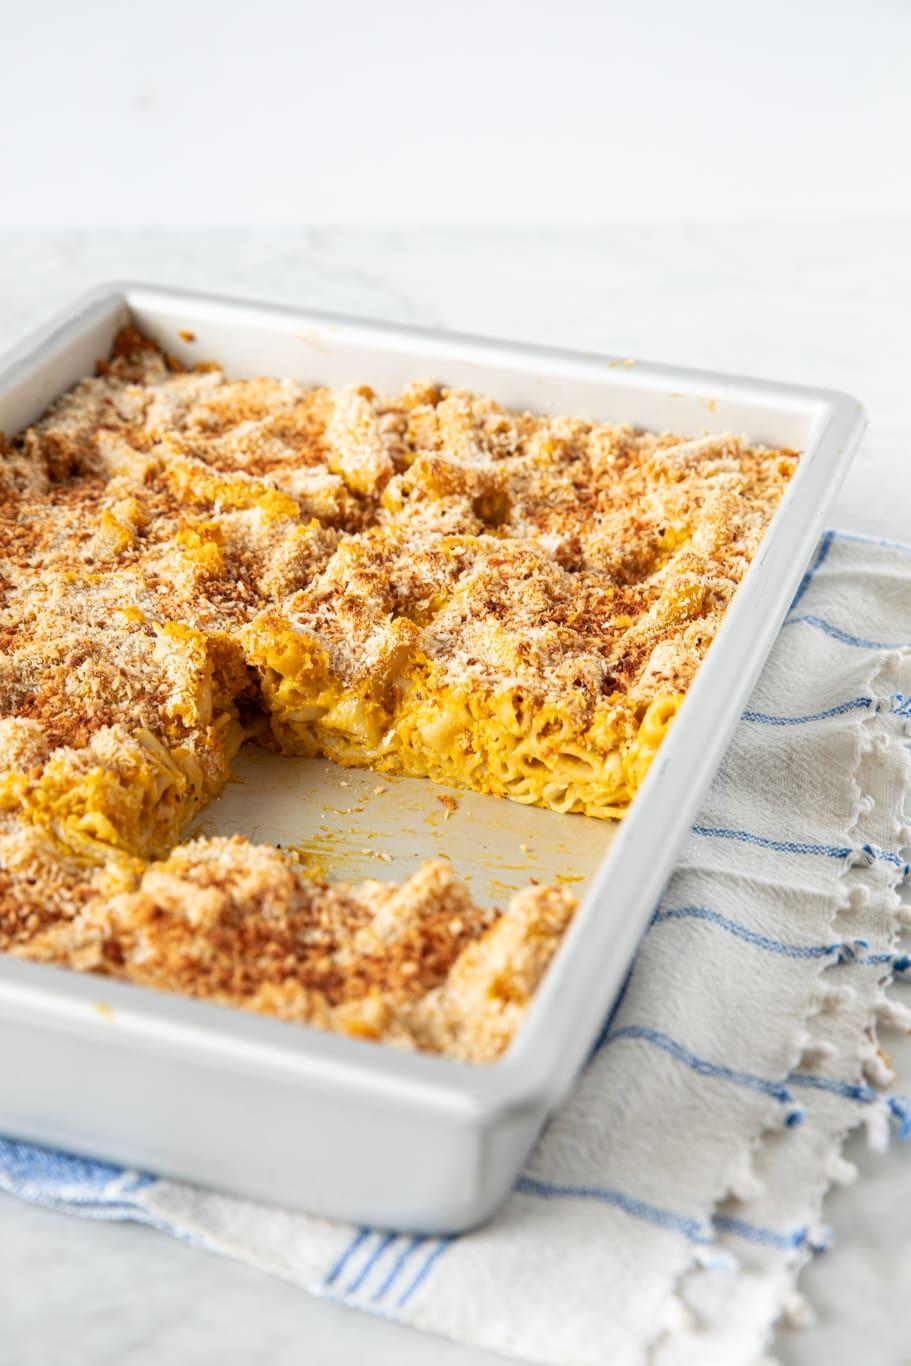 Casserole dish with vegan mac 'n' cheese pasta